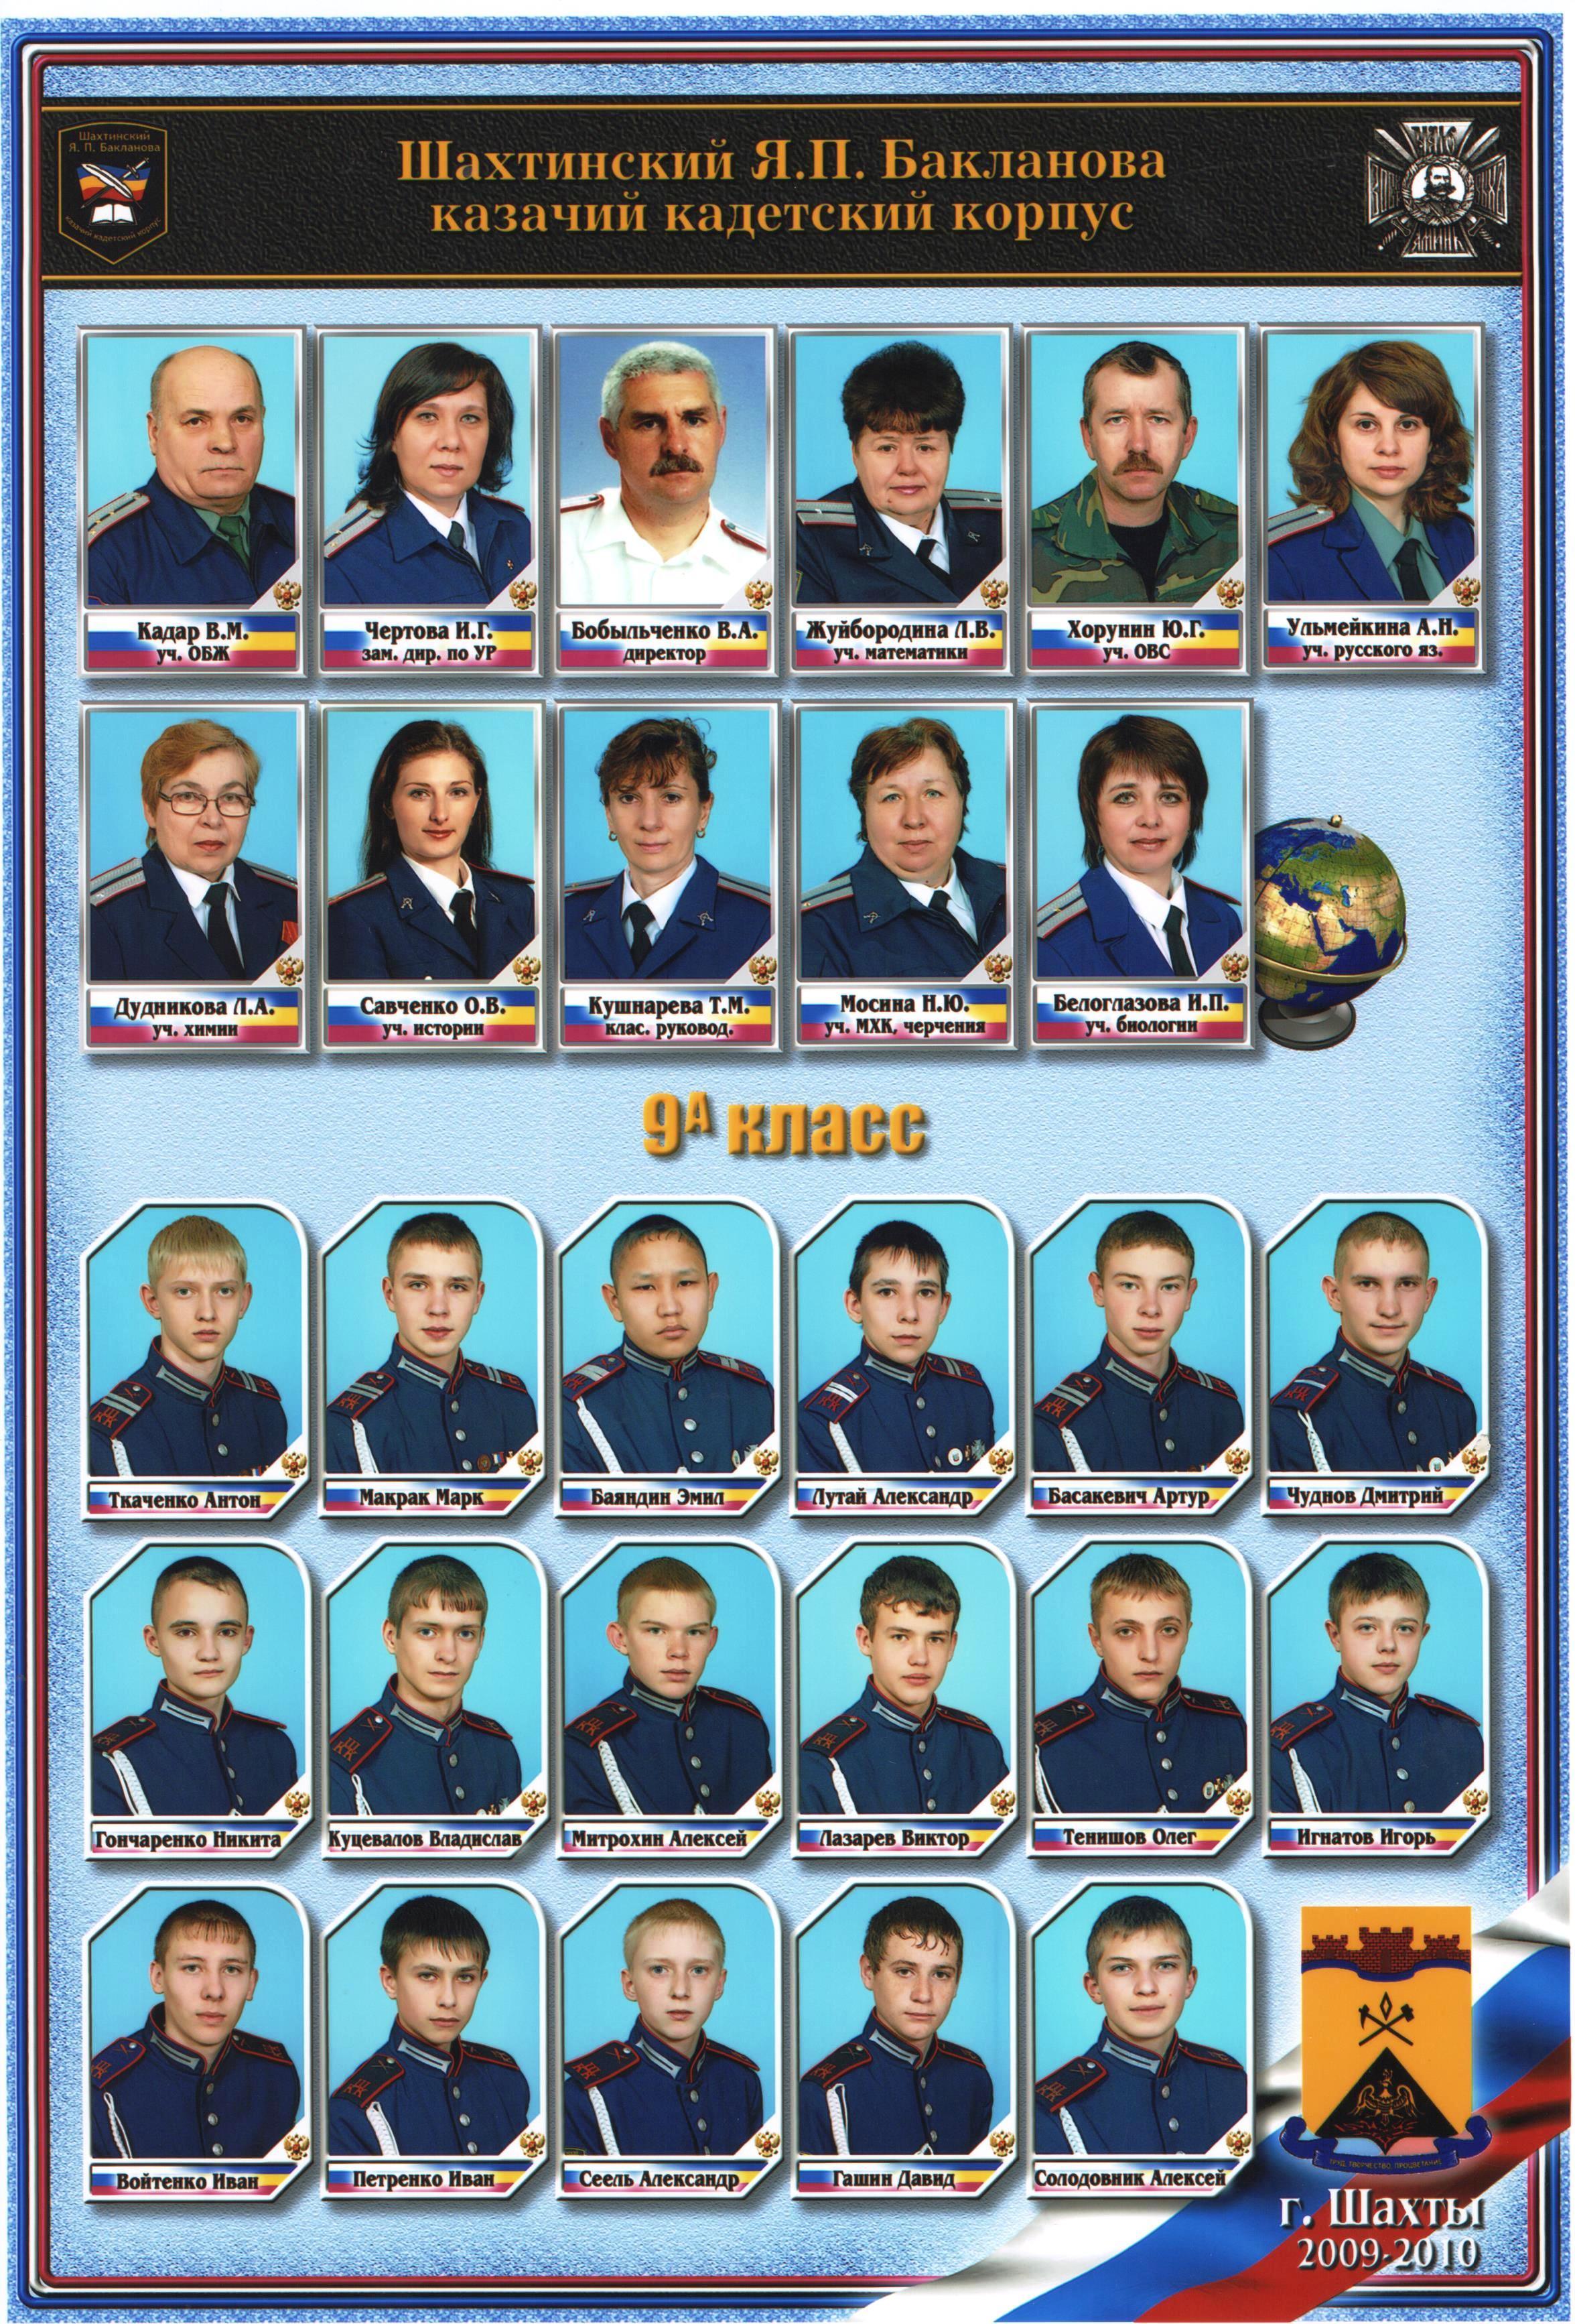 2010 9 а 001